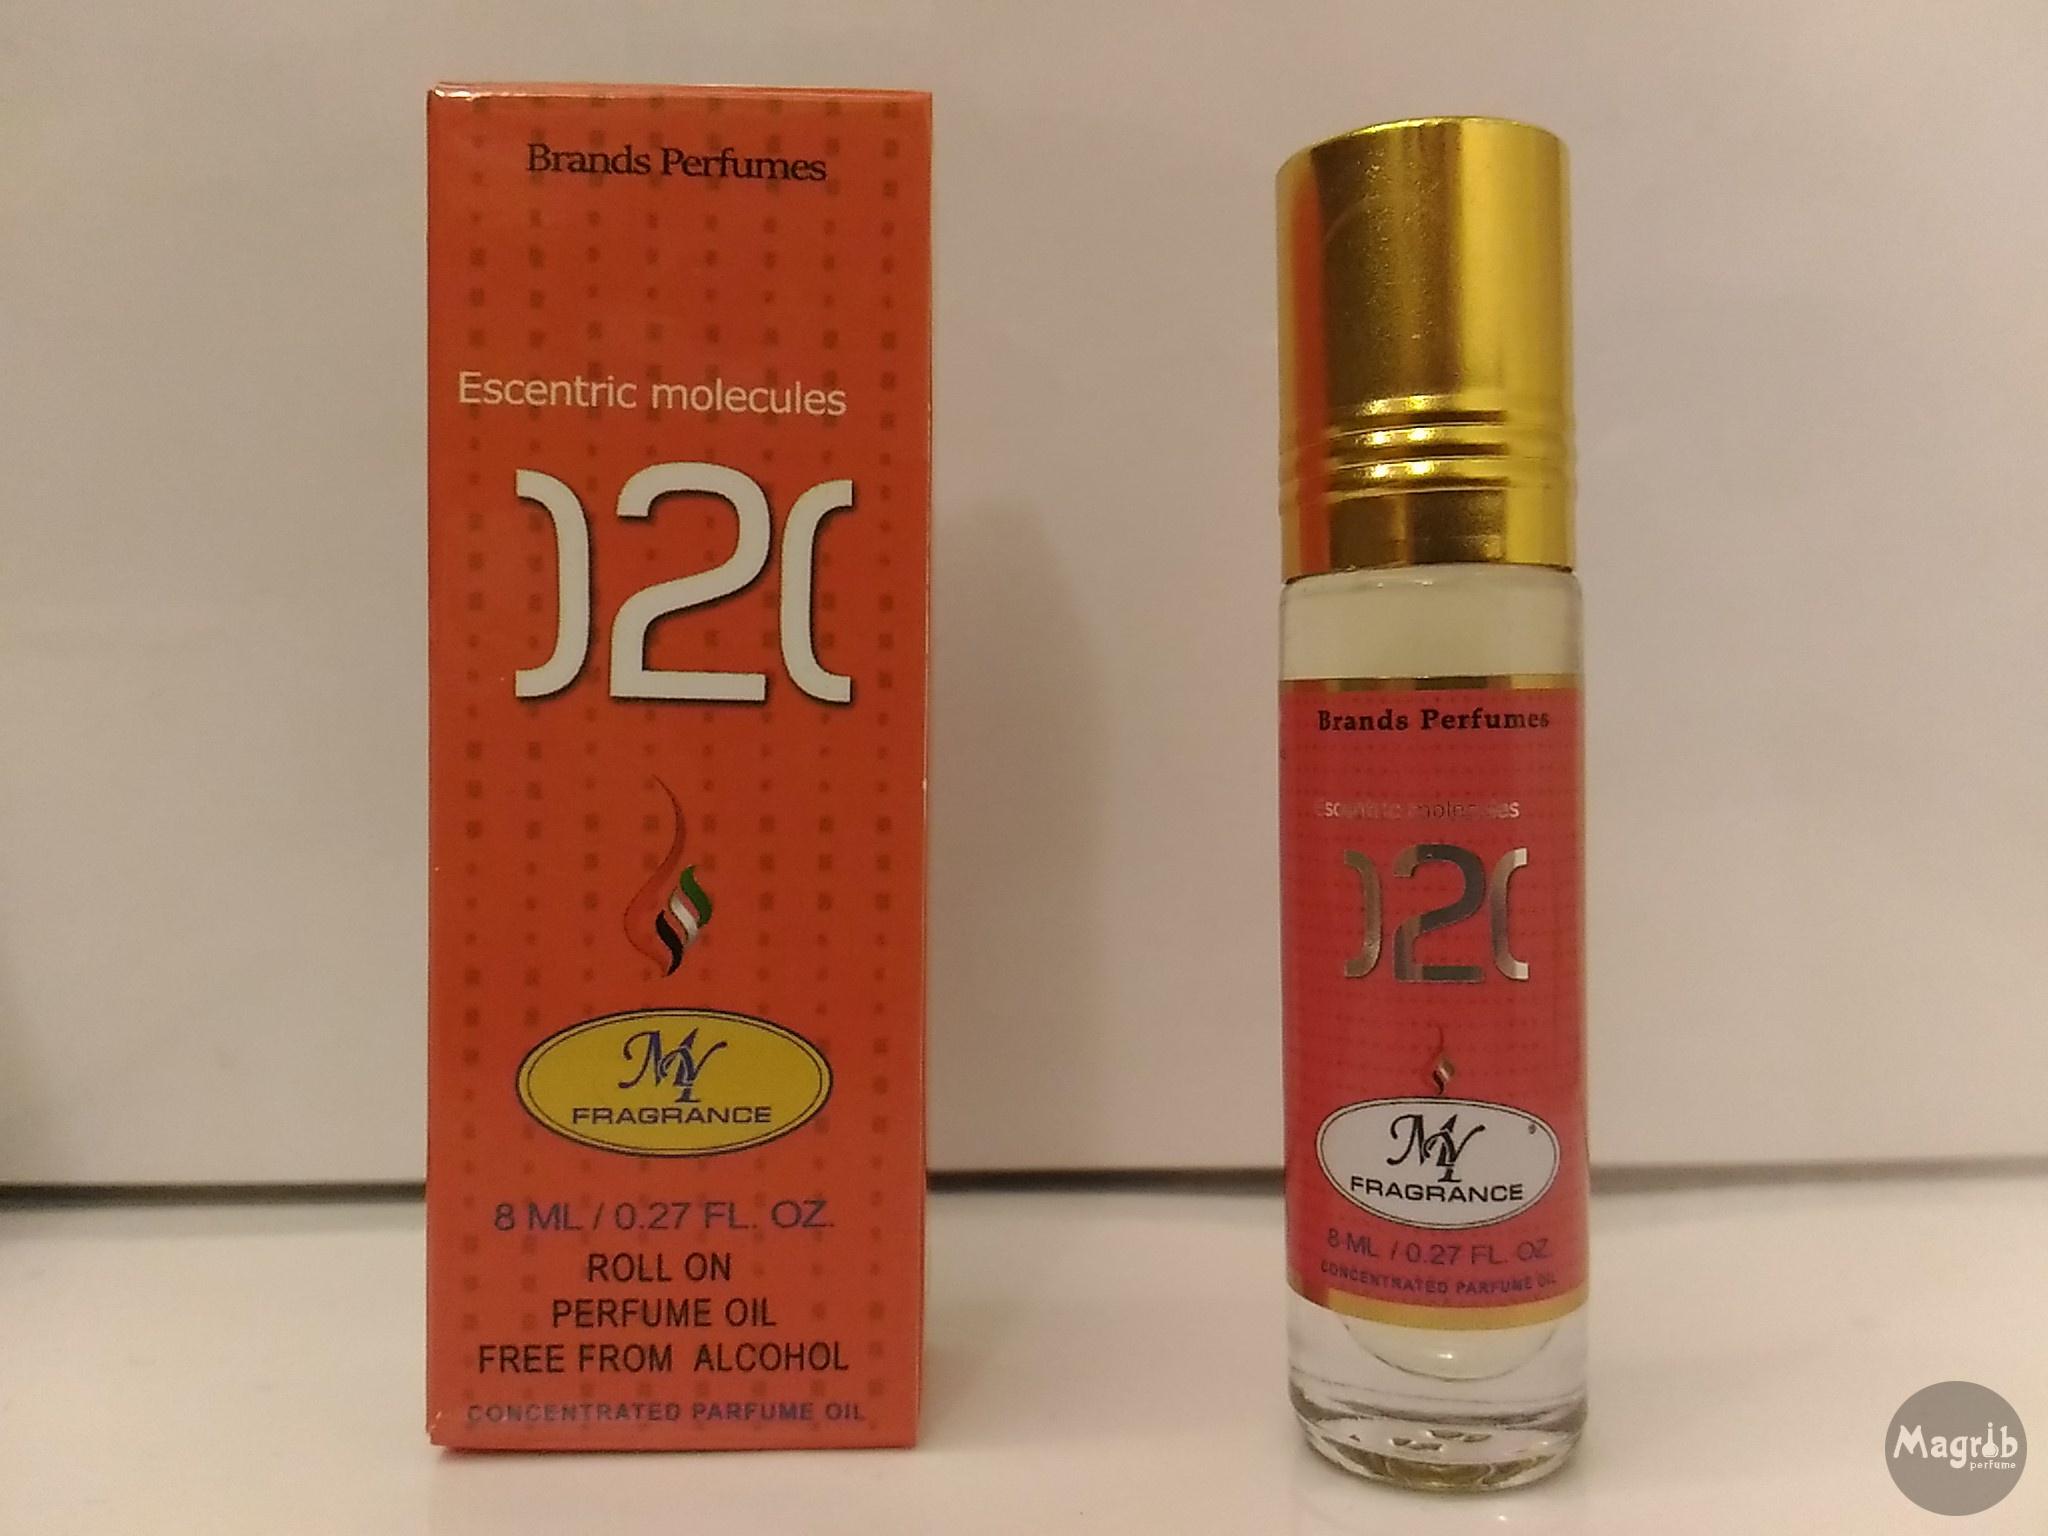 Ravza Molecule 02 8ml - унисекс, масляные духи